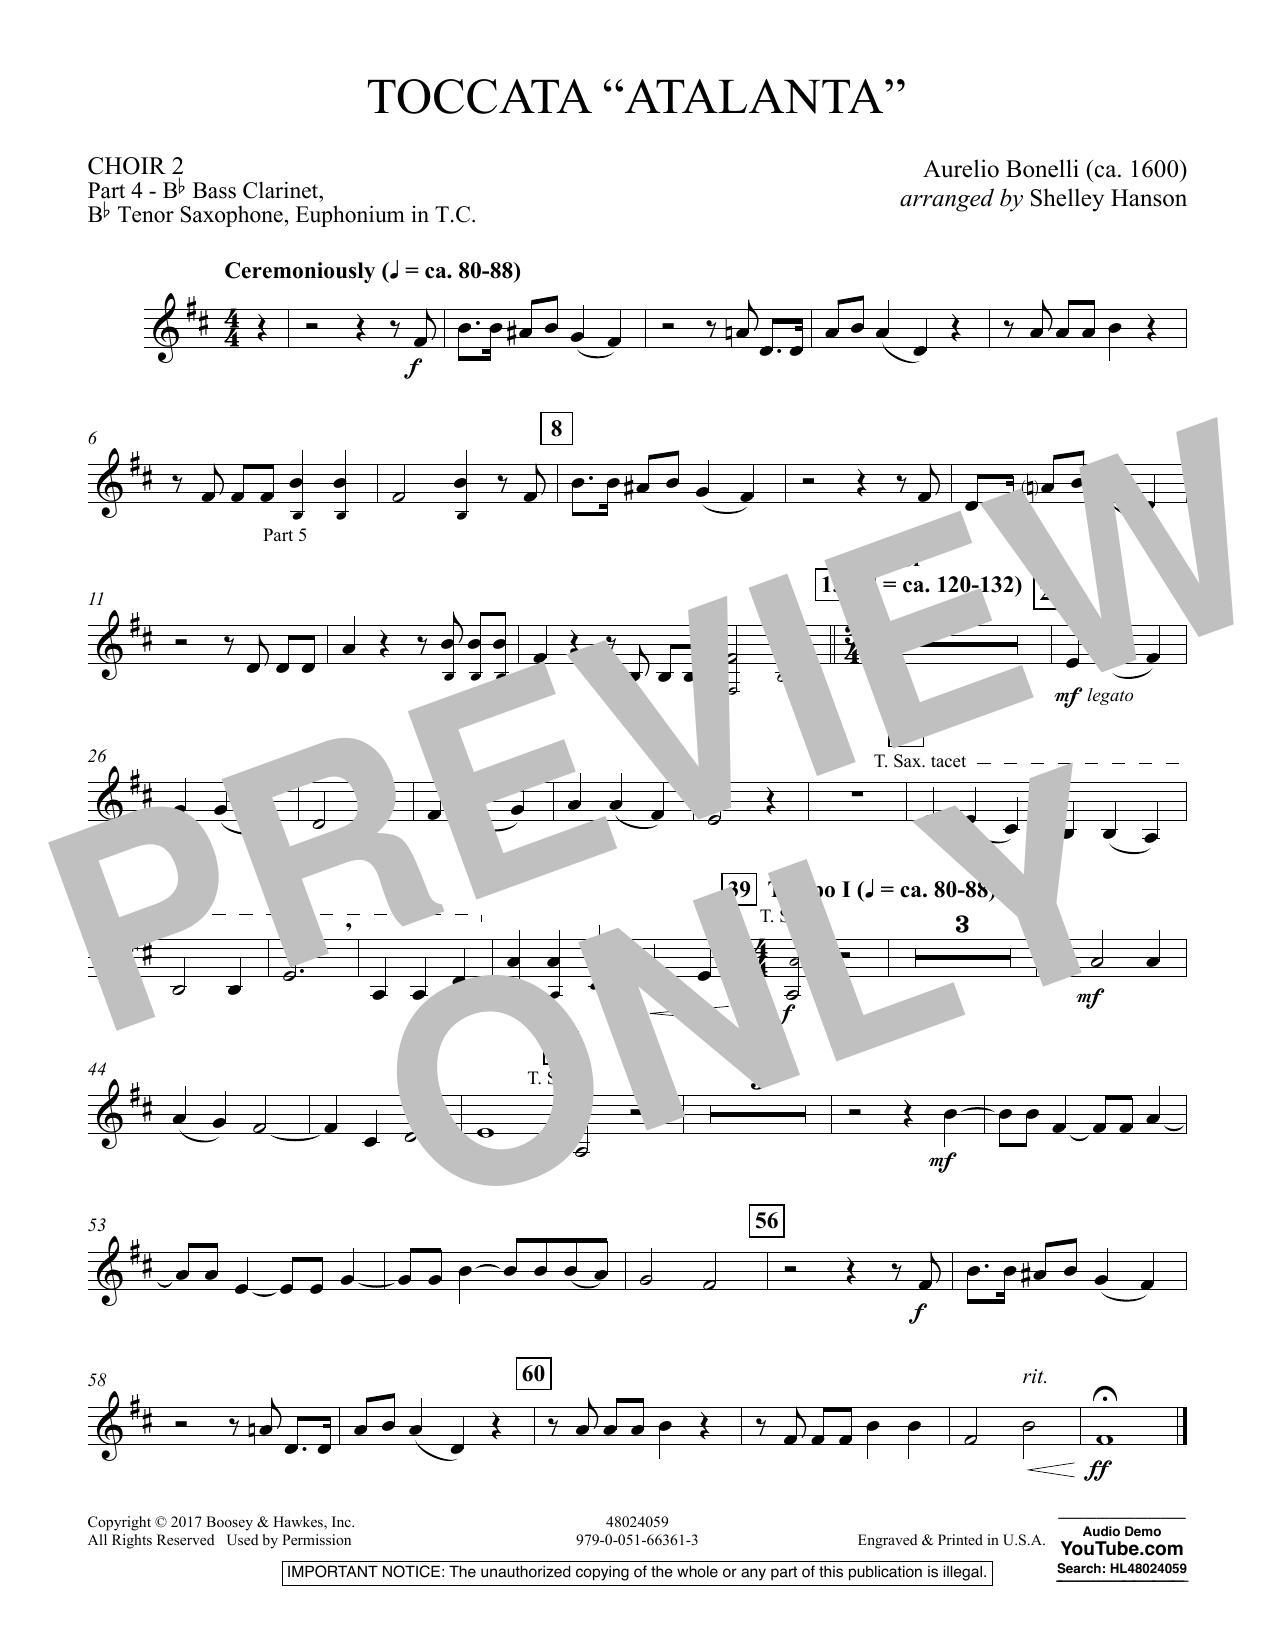 "Toccata (""Atalanta"") - Choir 2-Pt 4-B Cl,T Sx,Euph TC (Concert Band)"